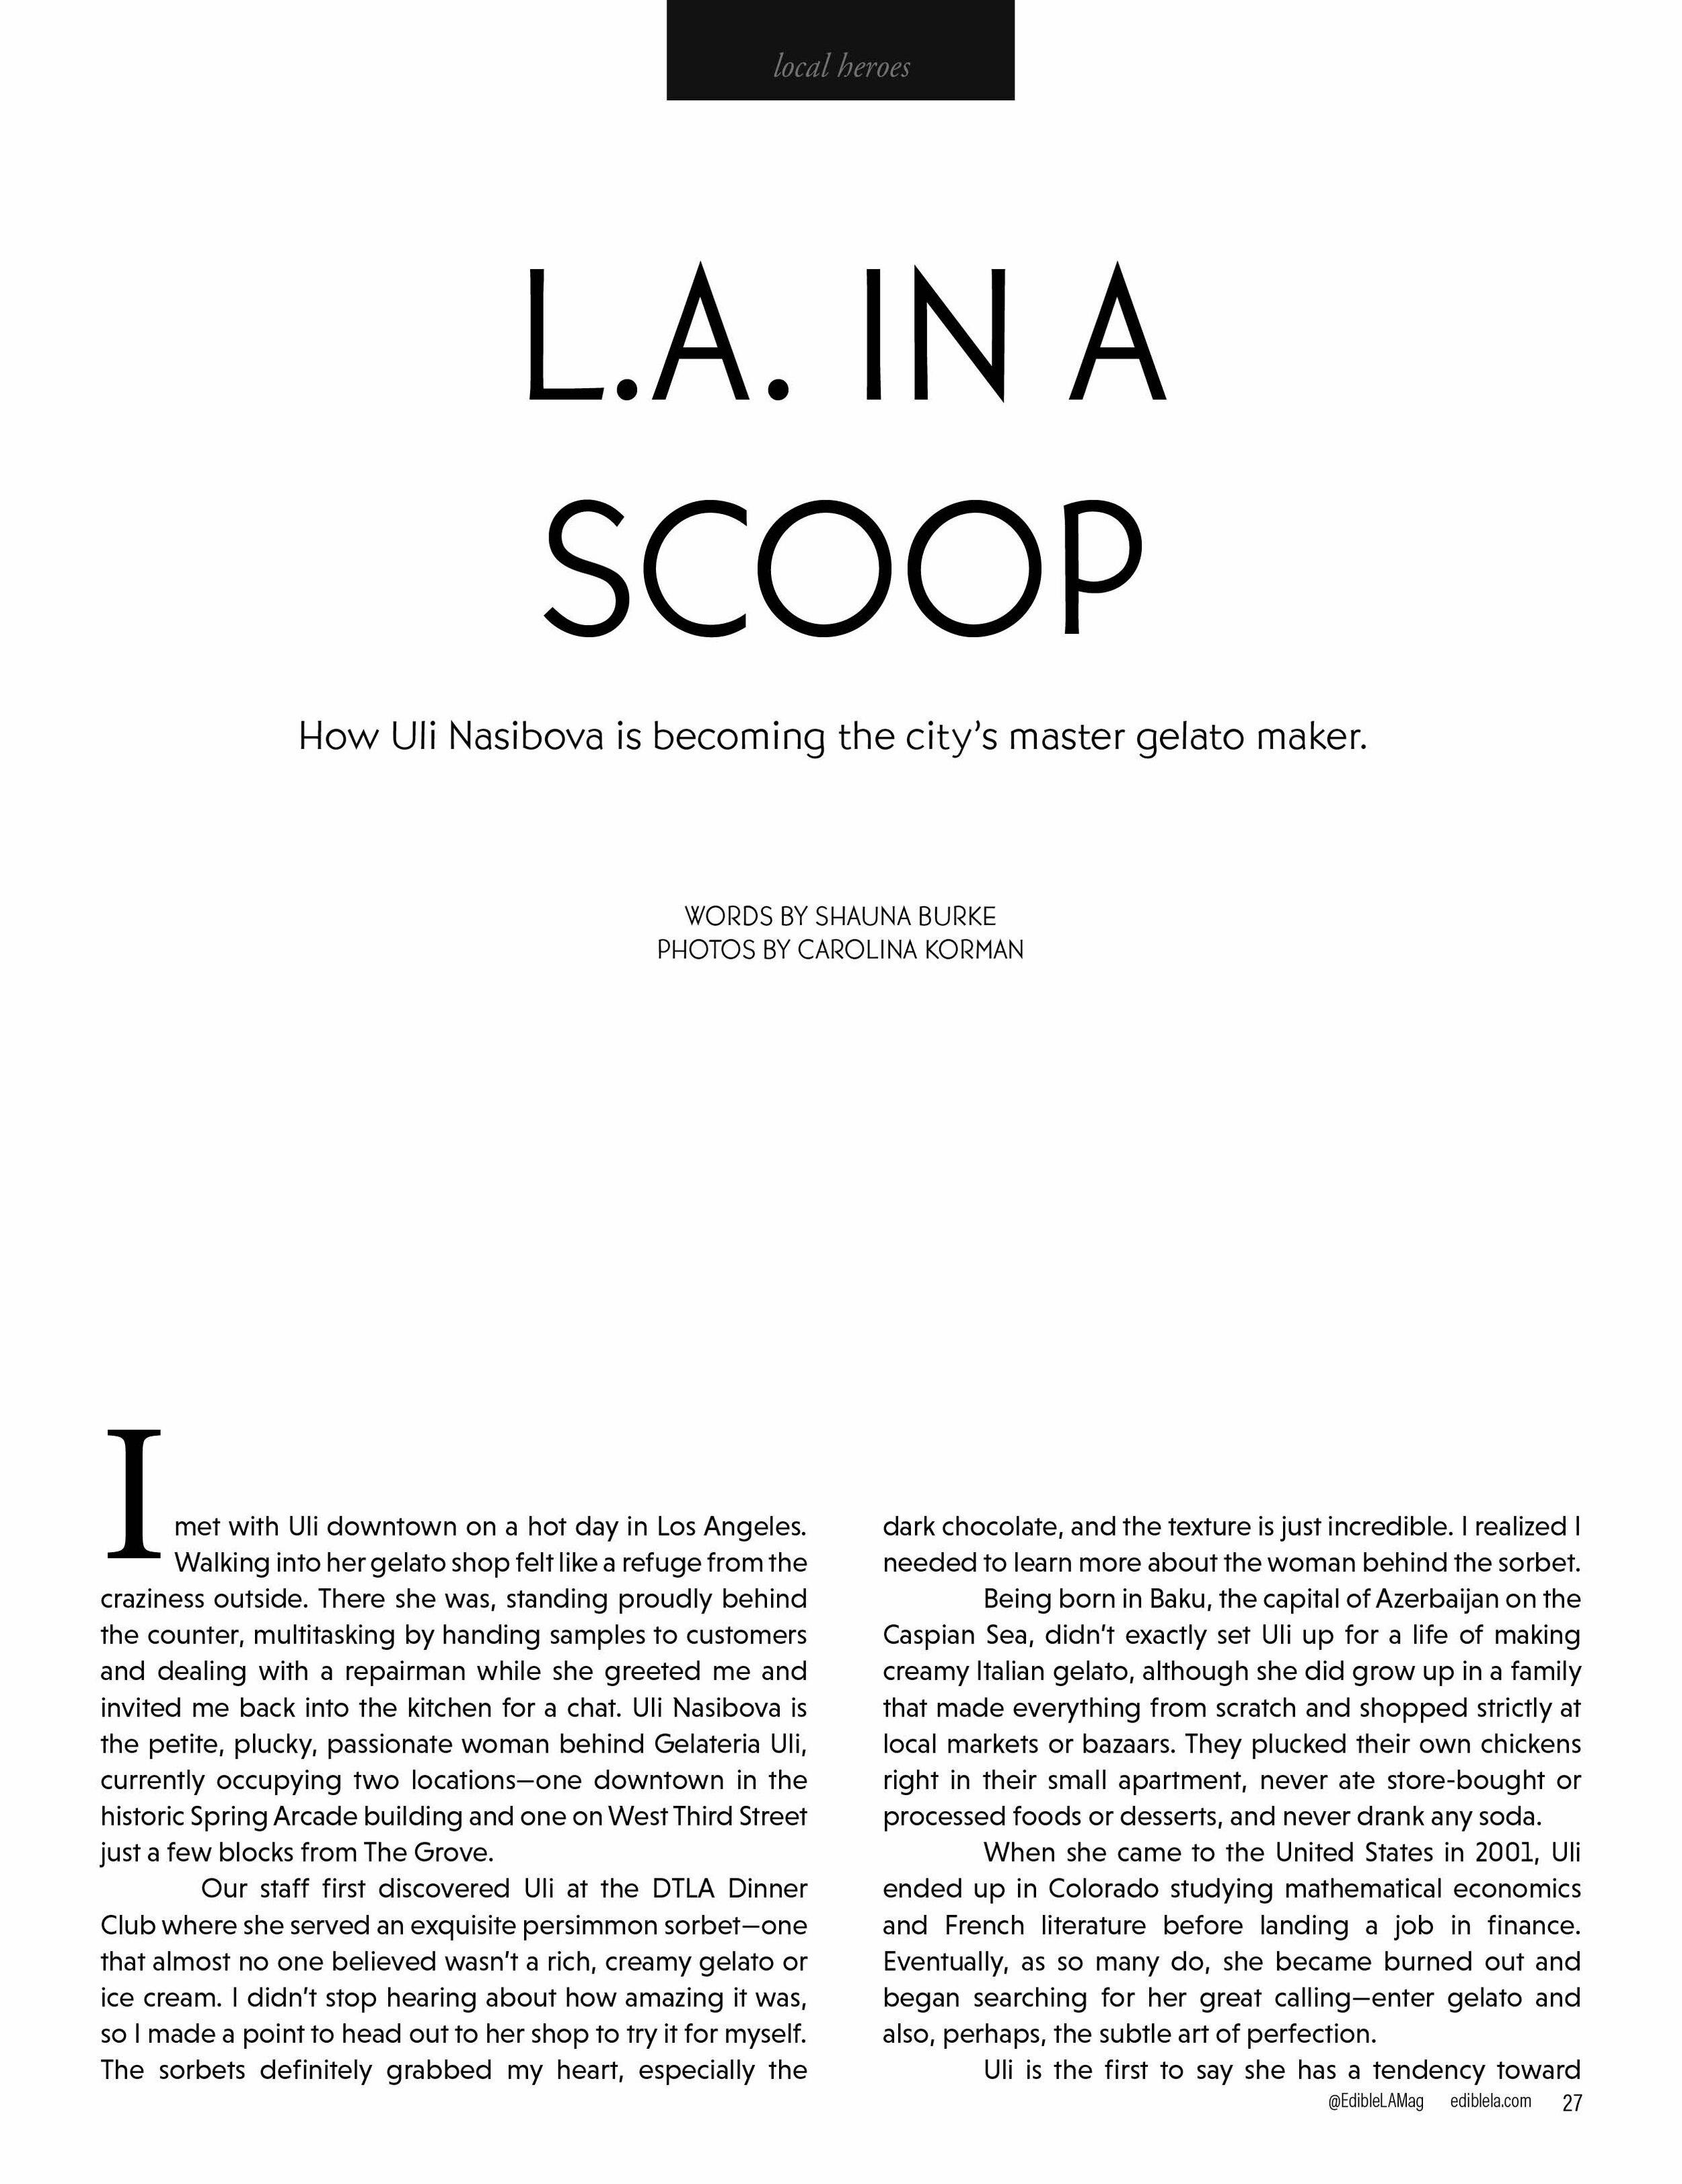 L.A. in a Scoop / Edible LA